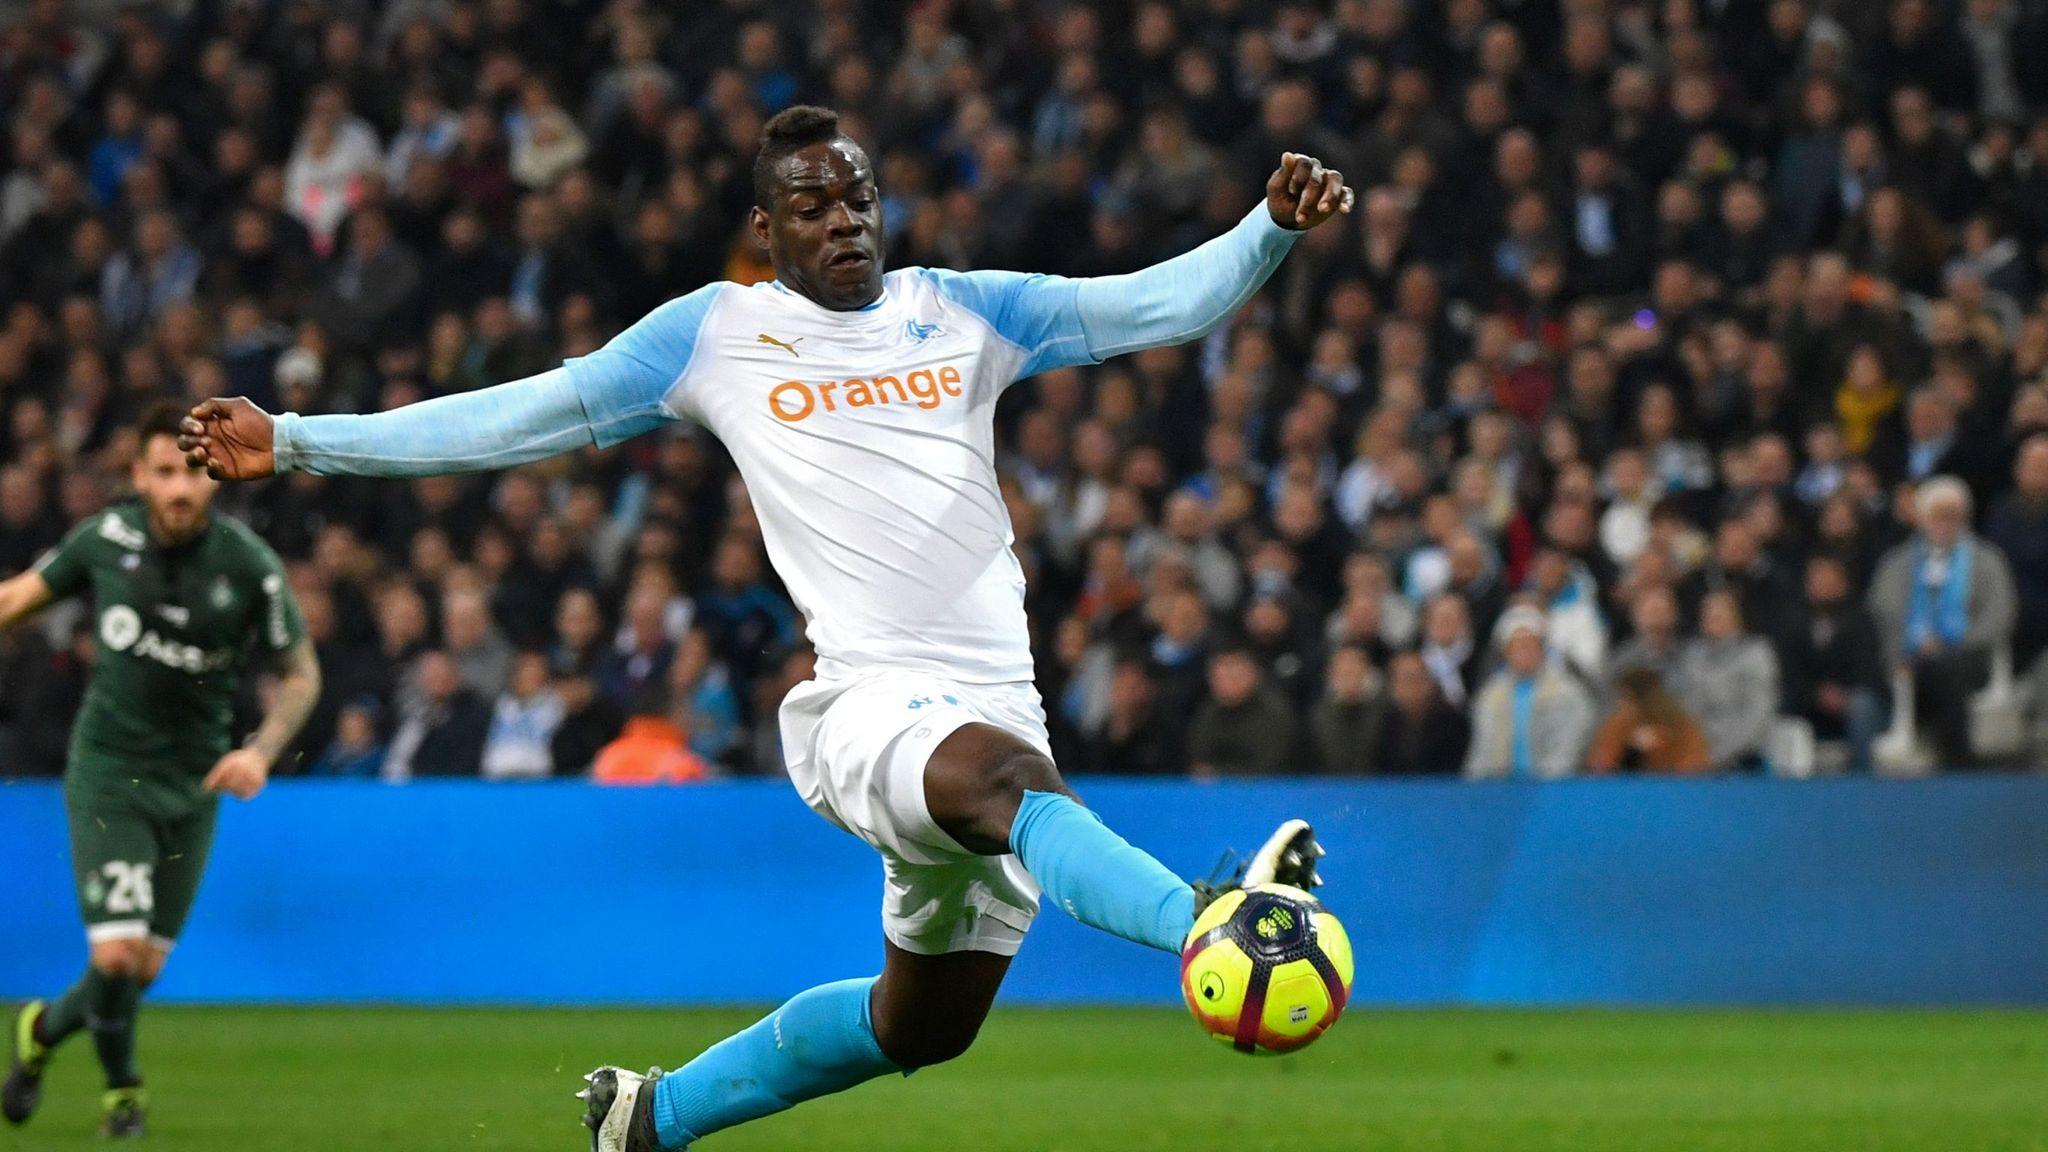 Ligue 1 round-up: Mario Balotelli nets winner against former club